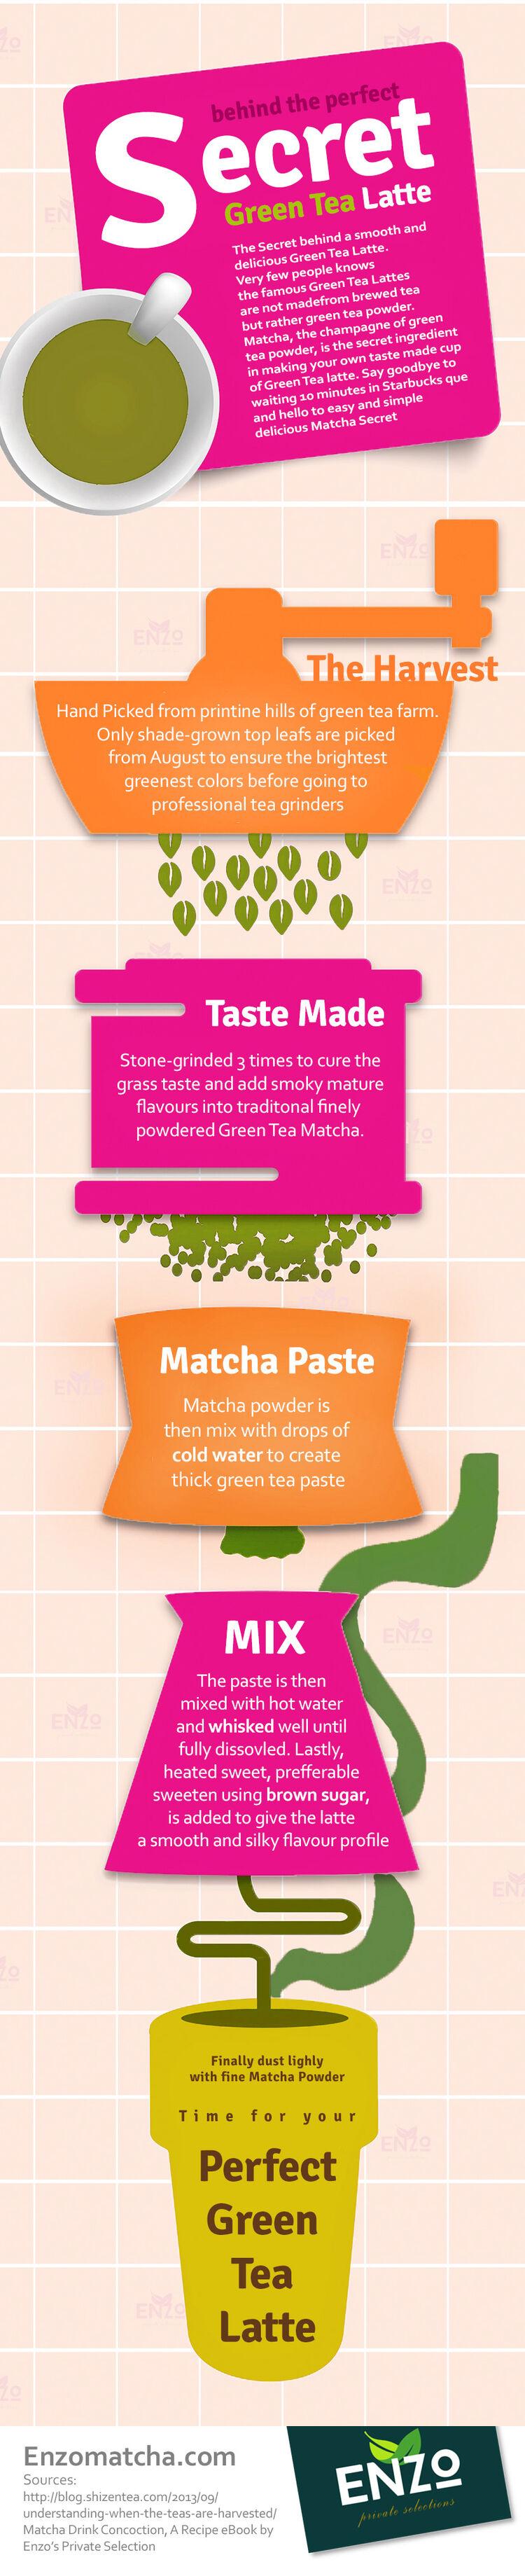 How-make-the-Perfect-Green-Tea-Latte-Info